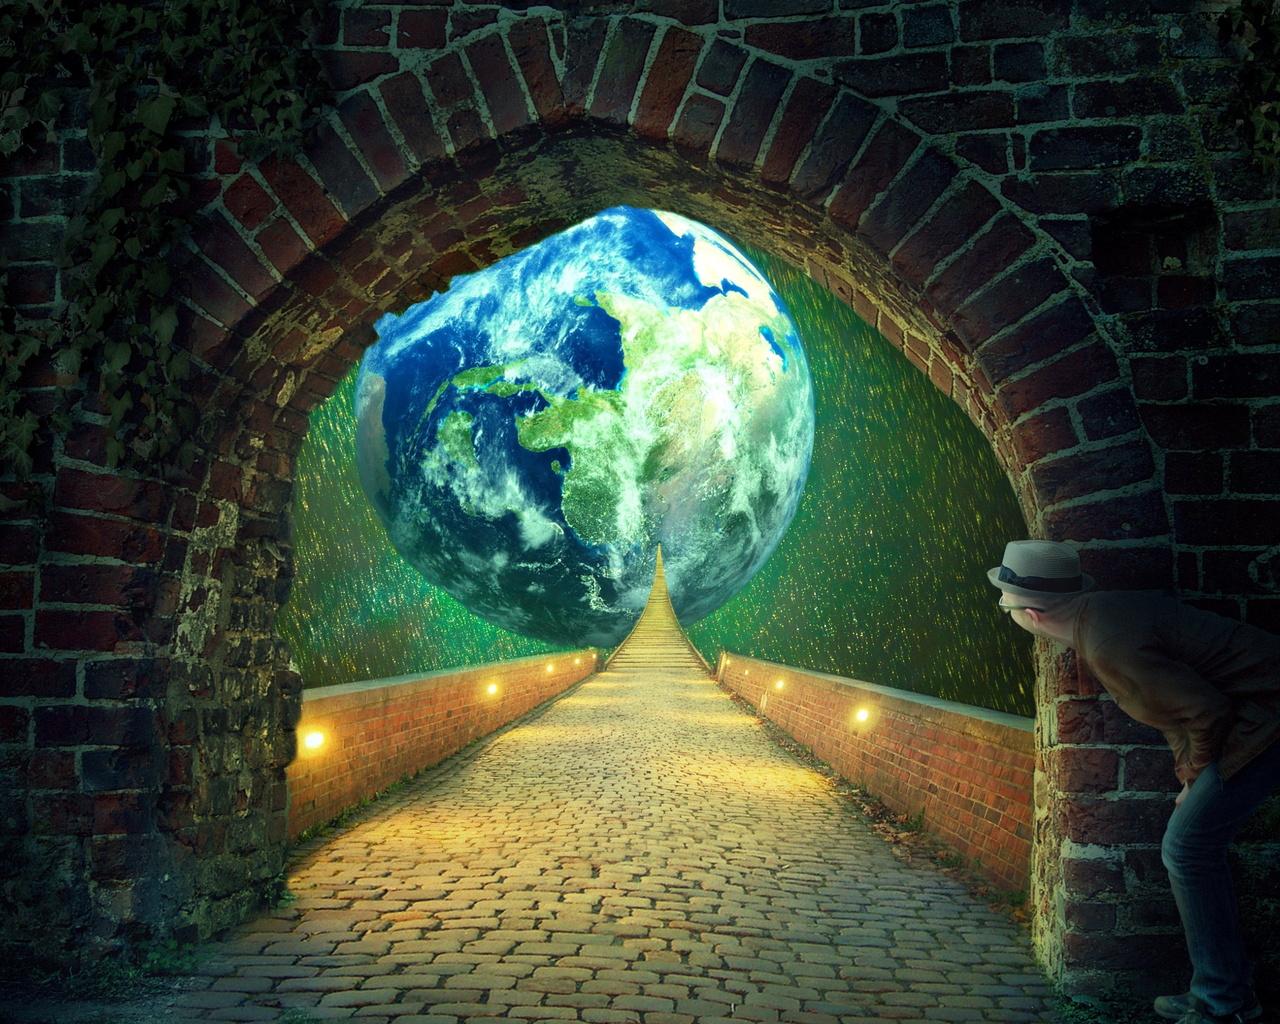 арка, дорога, планета, фотоманипуляция